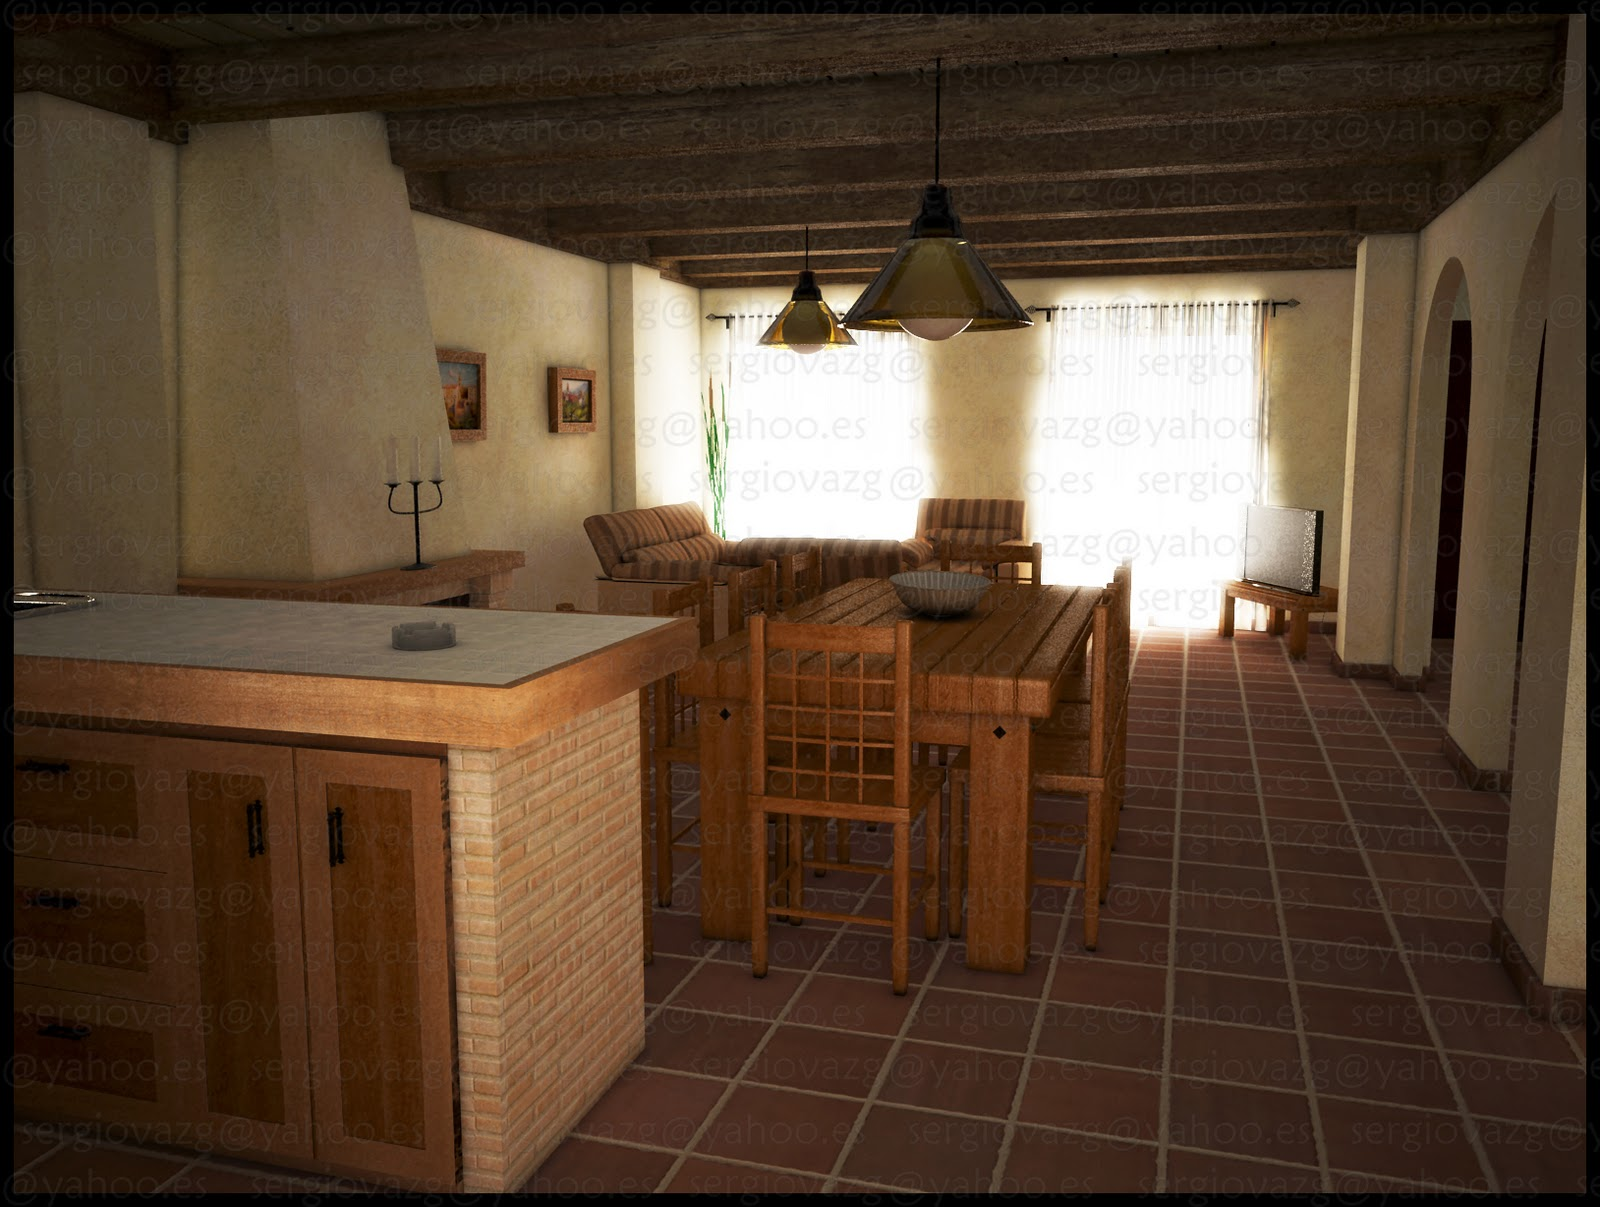 3dgr fica interiores casa rural for Interiores de apartamentos